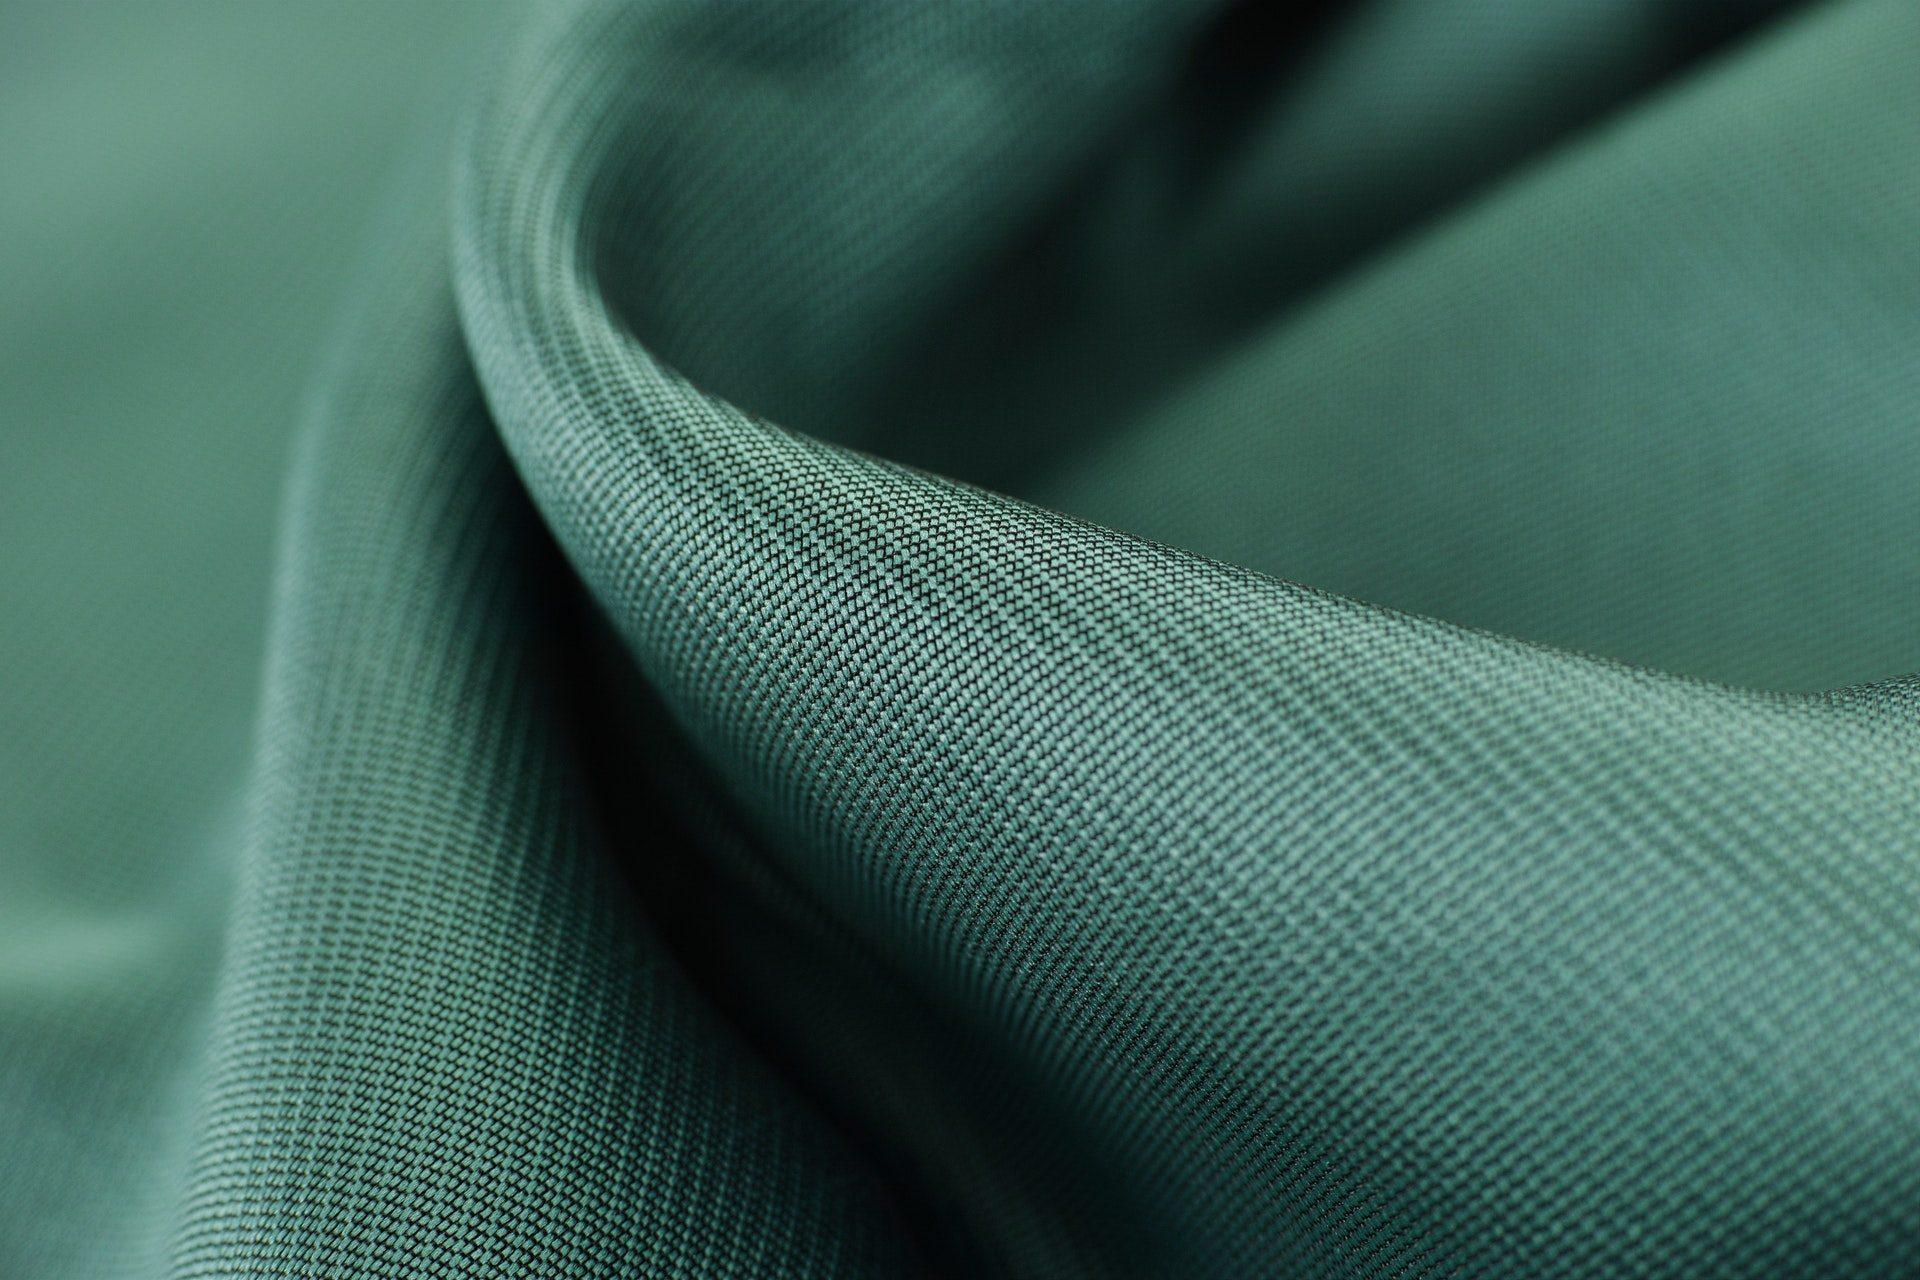 close-view-pf-green-textile-1487834